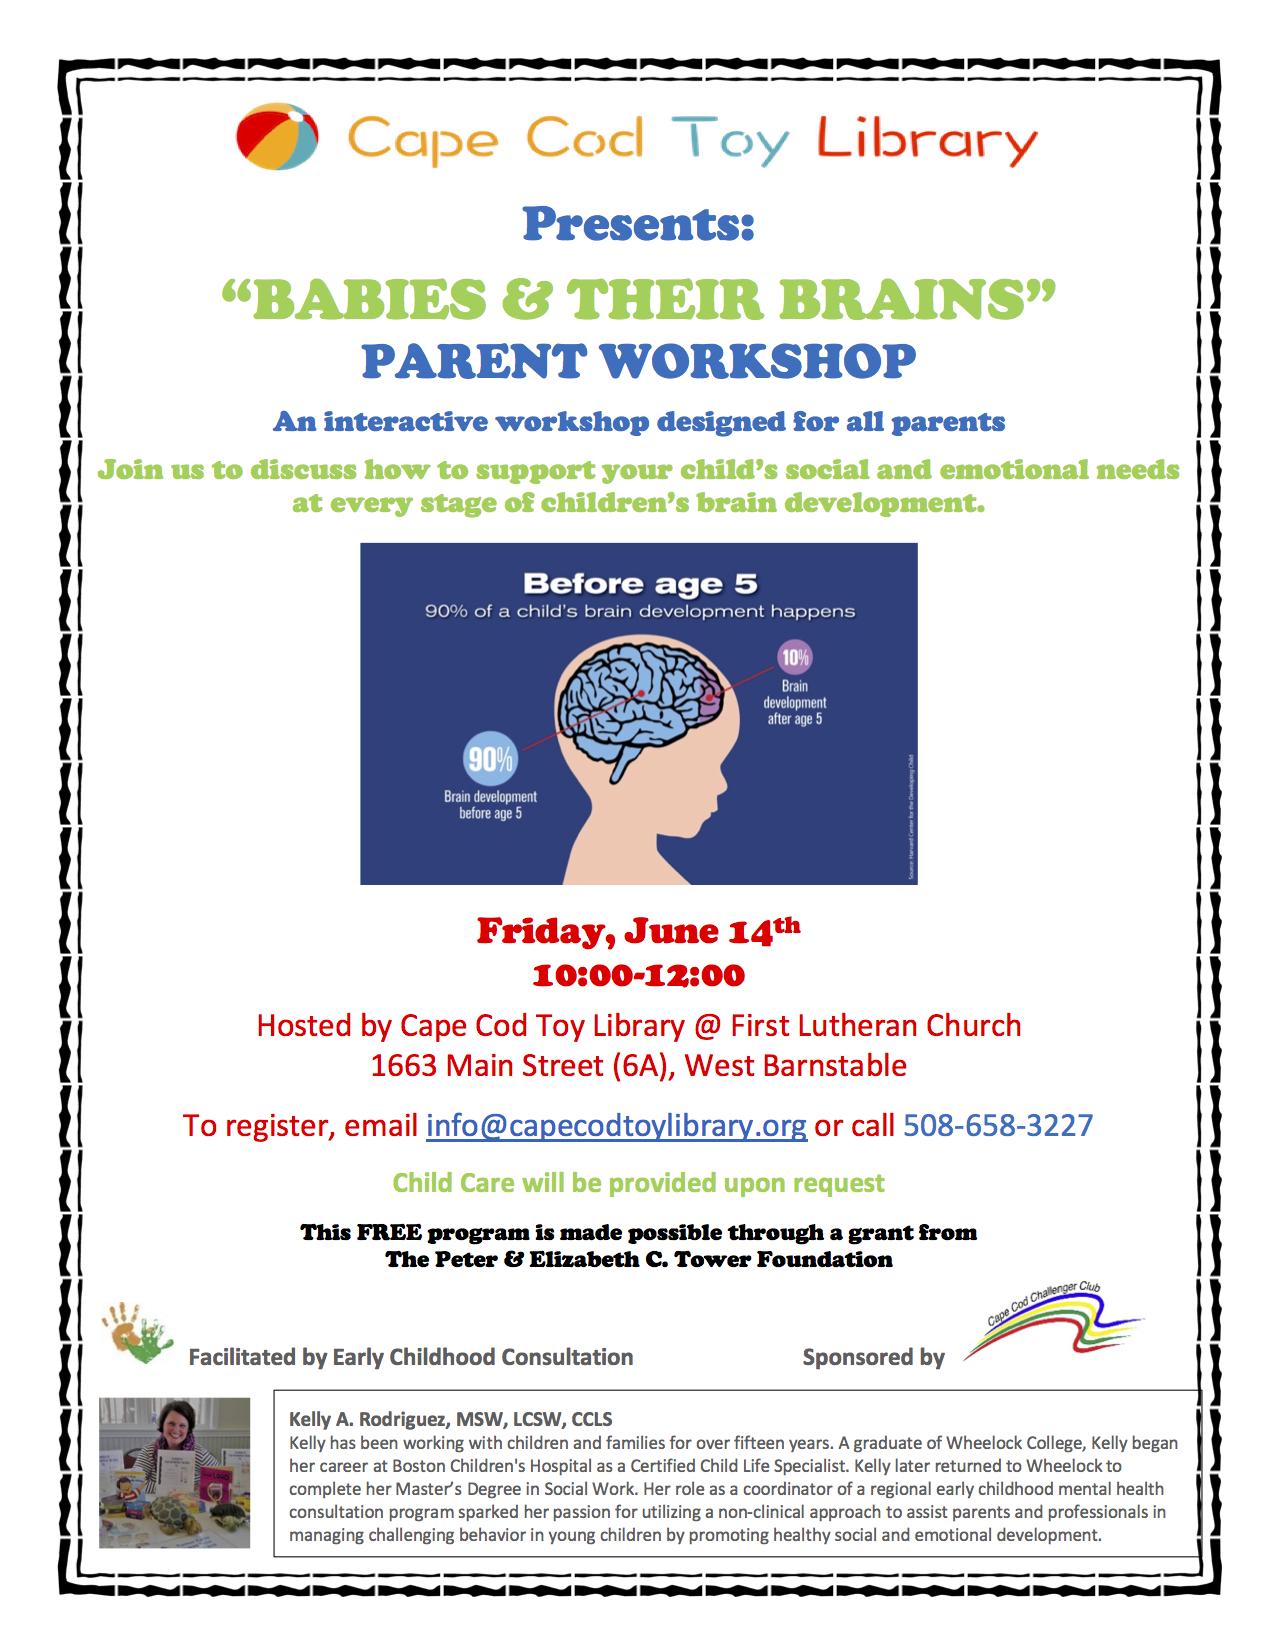 CCTL Babies & Brains Parent Workshop Flyer .jpg